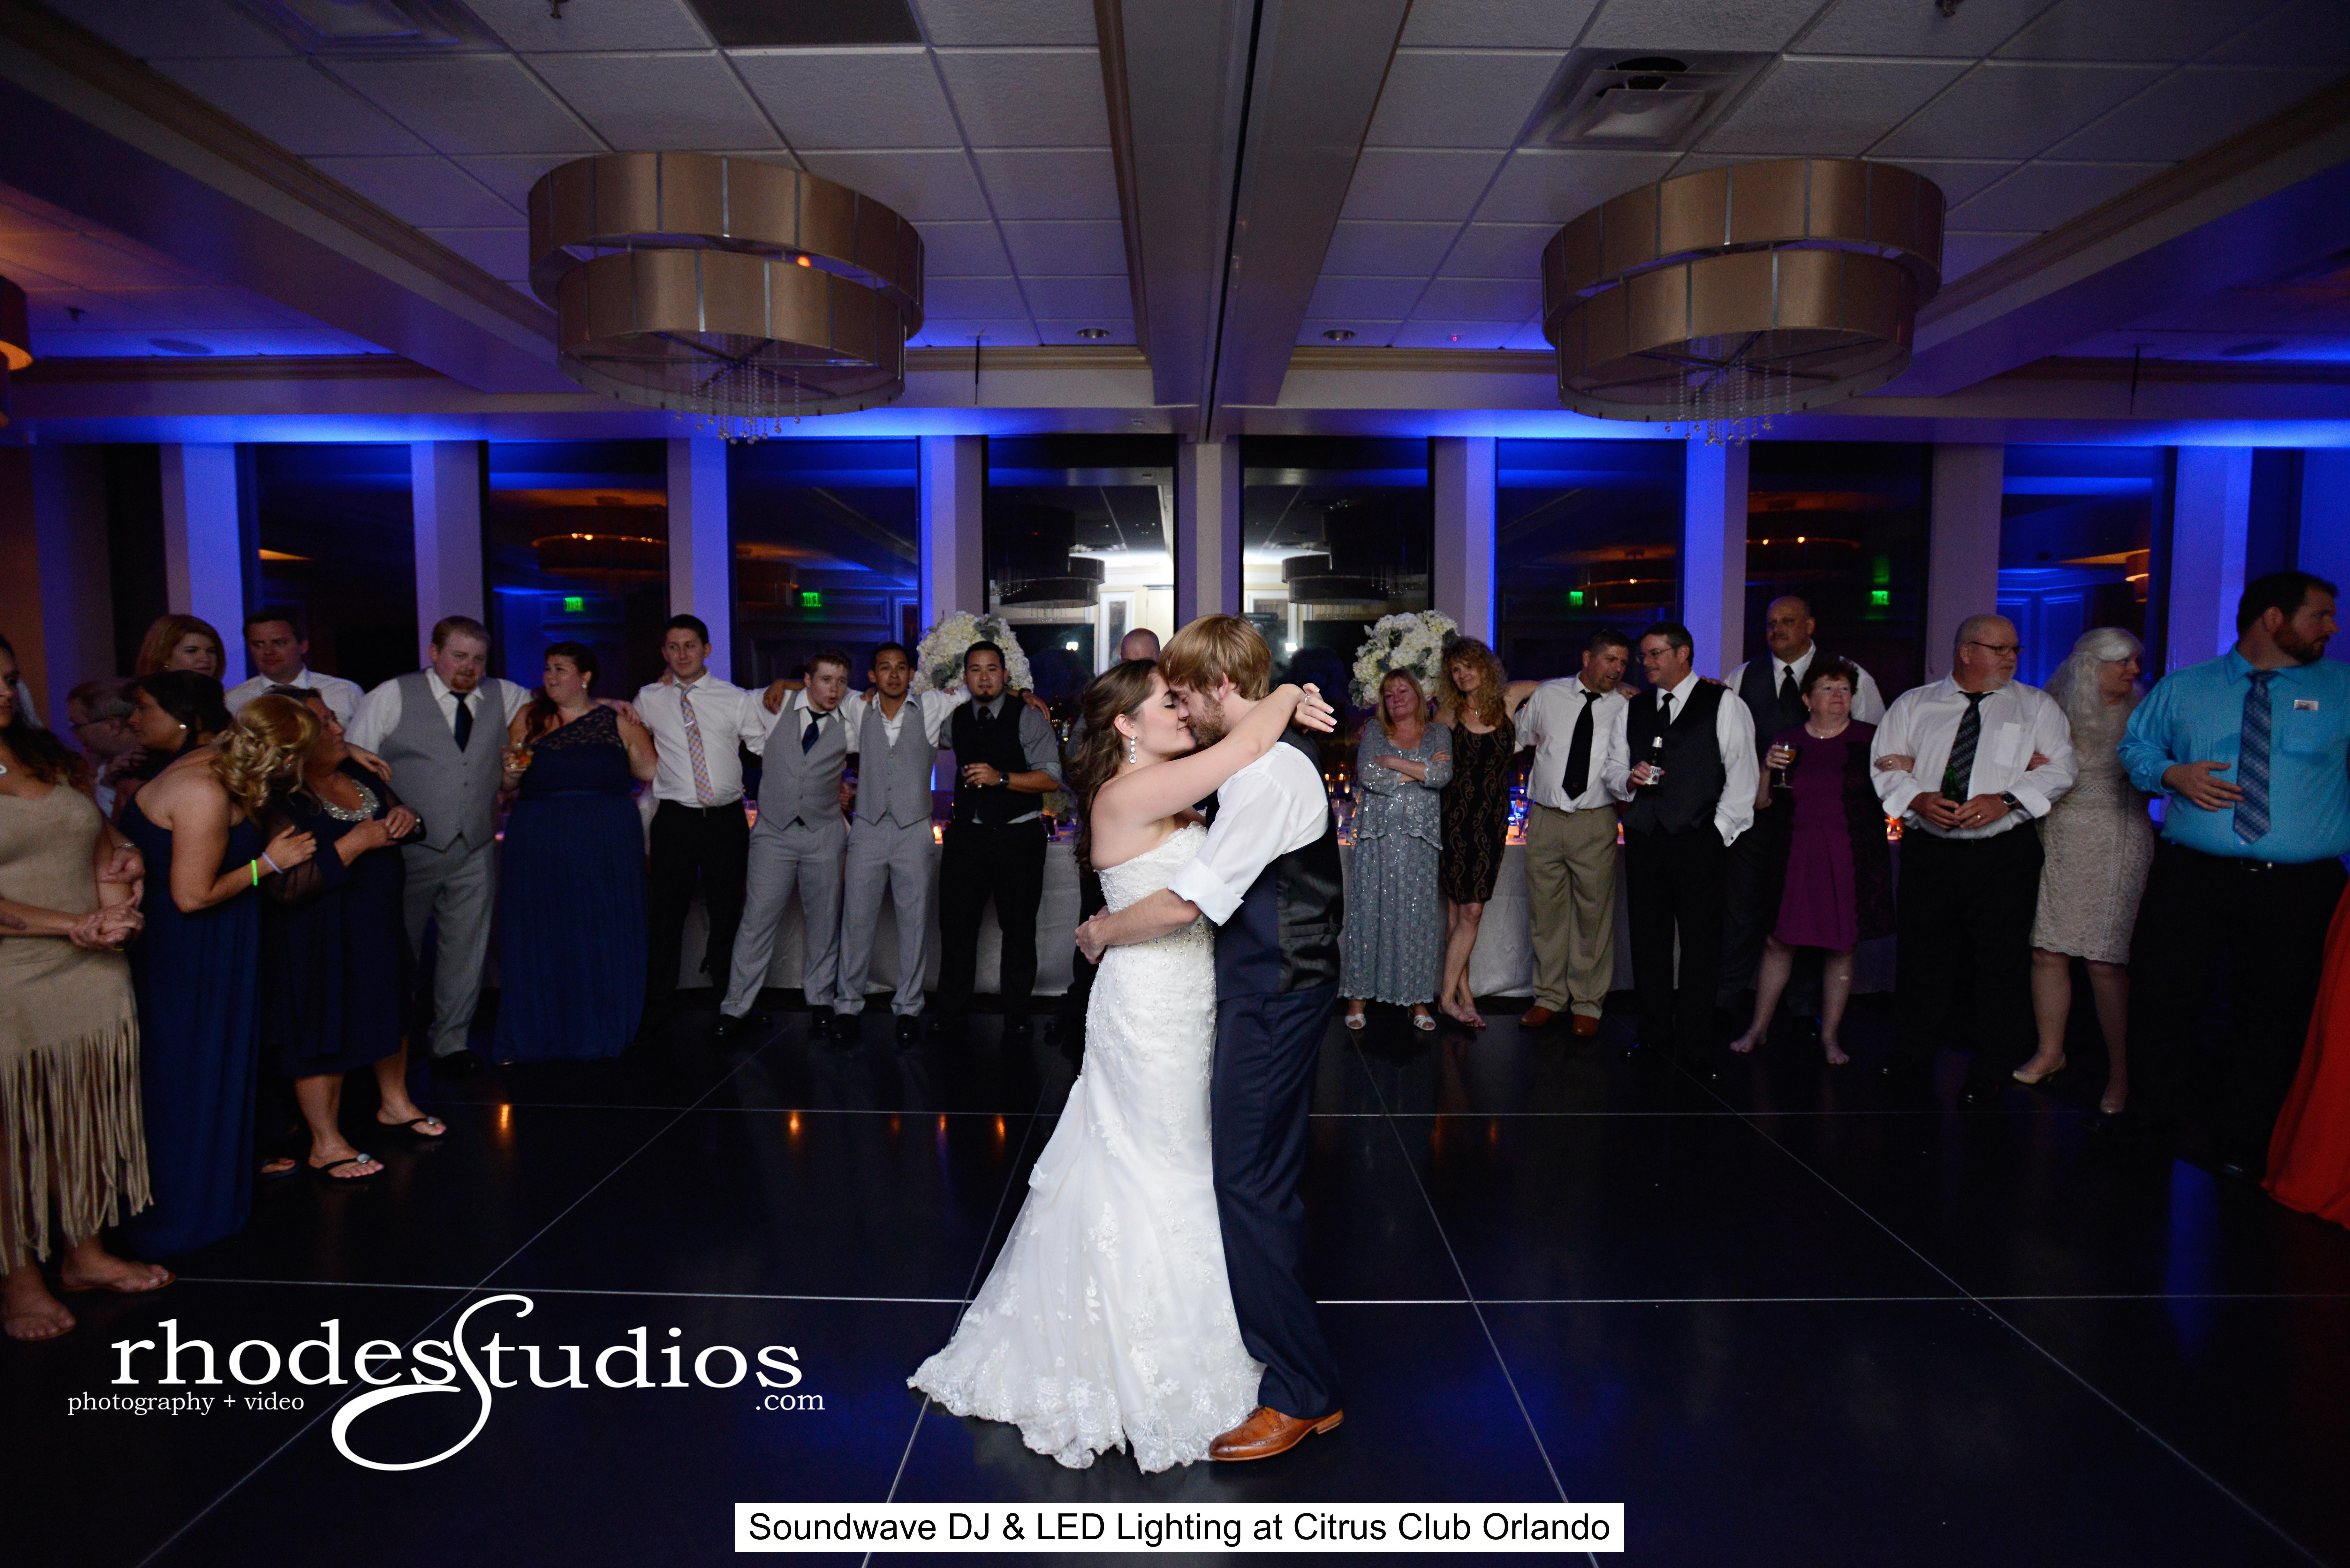 Citrus Club Orlando Wedding 3 Soundwave Entertainment